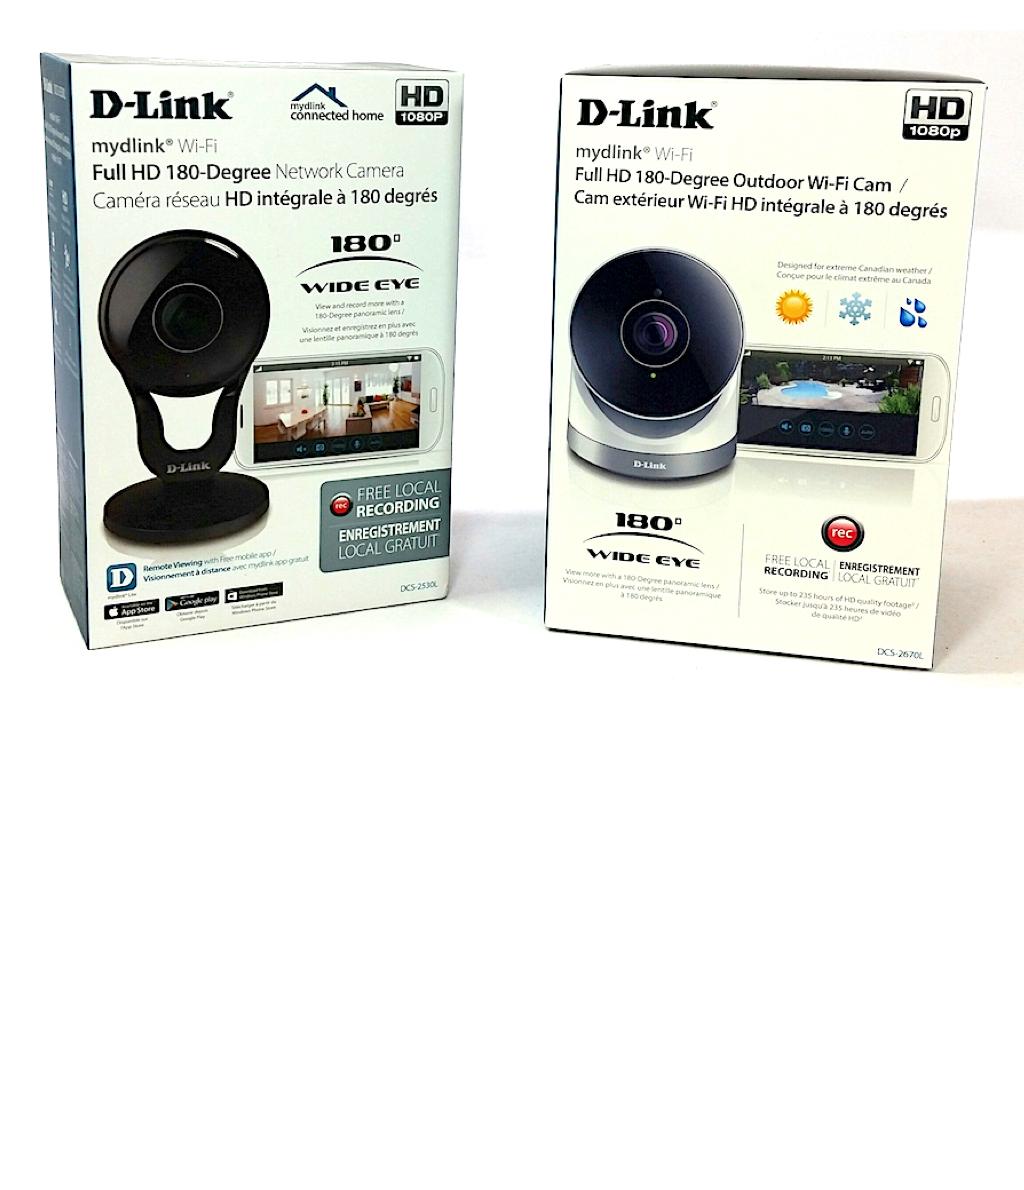 D-Link 180º Indoor and Outdoor HD Cameras Review [video] | Best Buy Blog